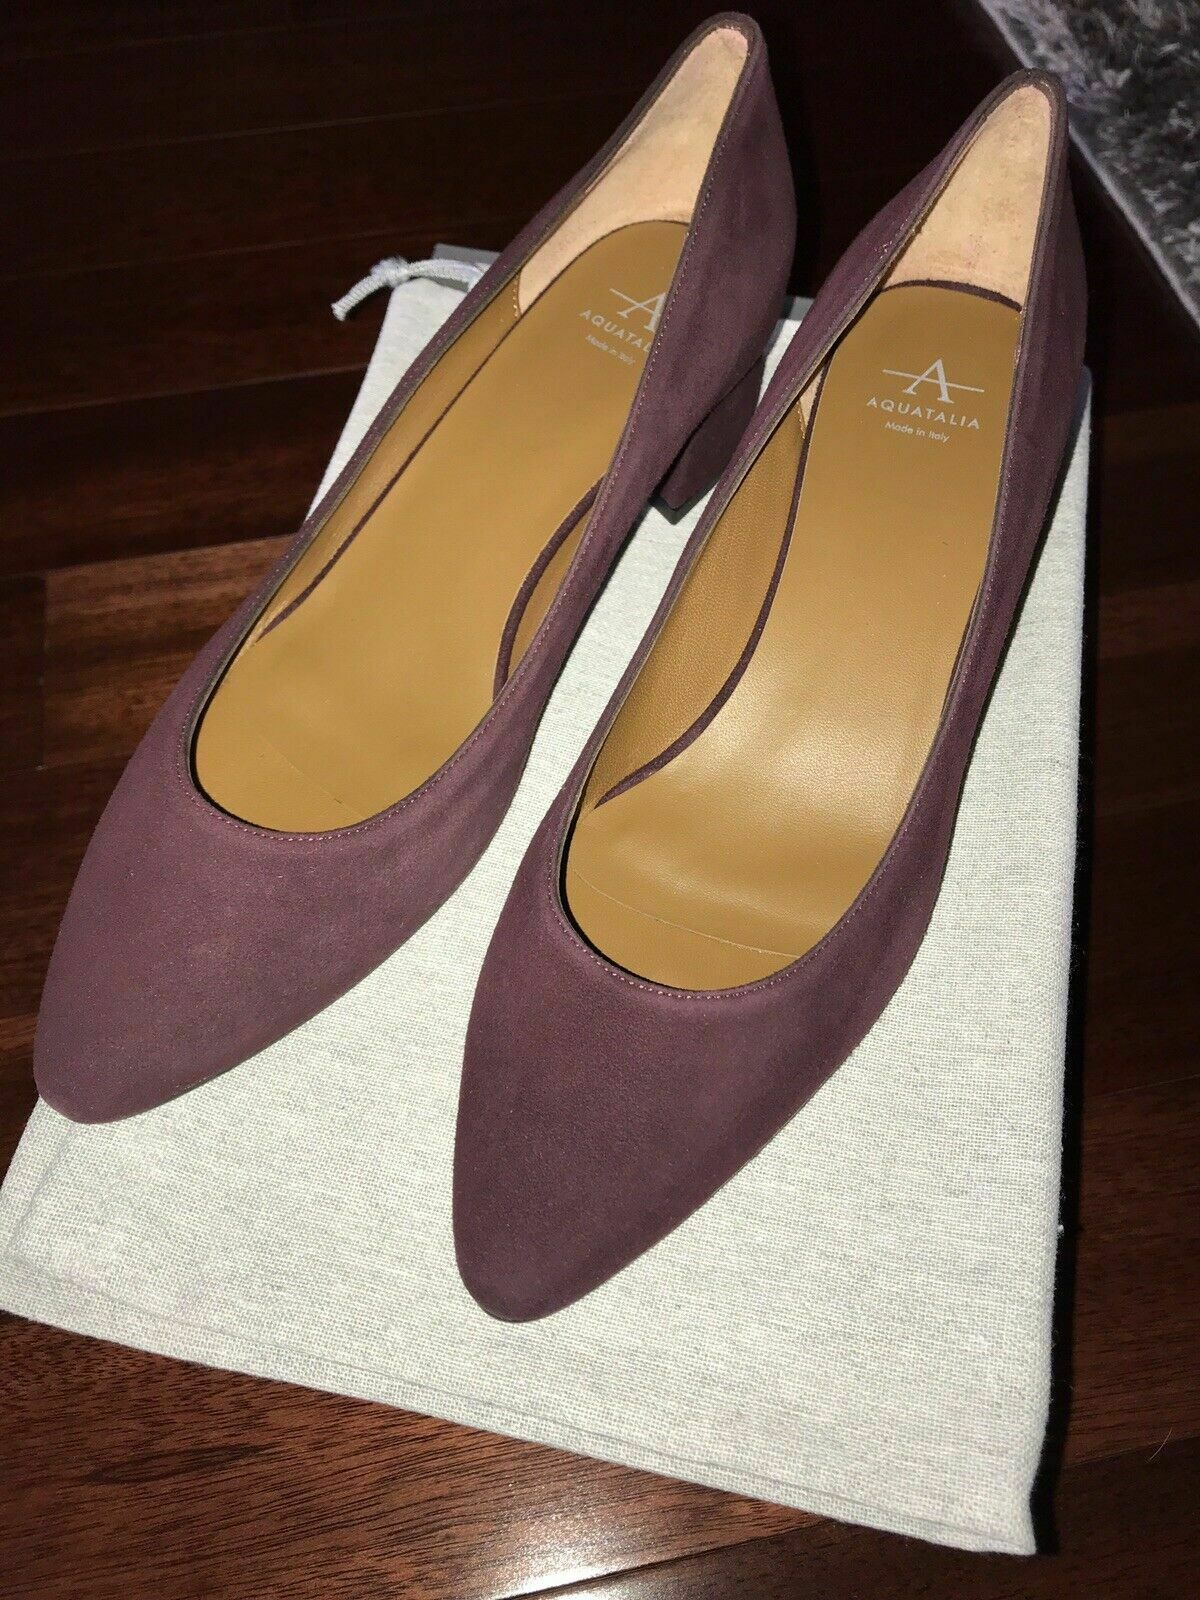 NWB AQUATALIA PHEOBE Suede Oxblood Pumps  Heels shoes sz 7.5